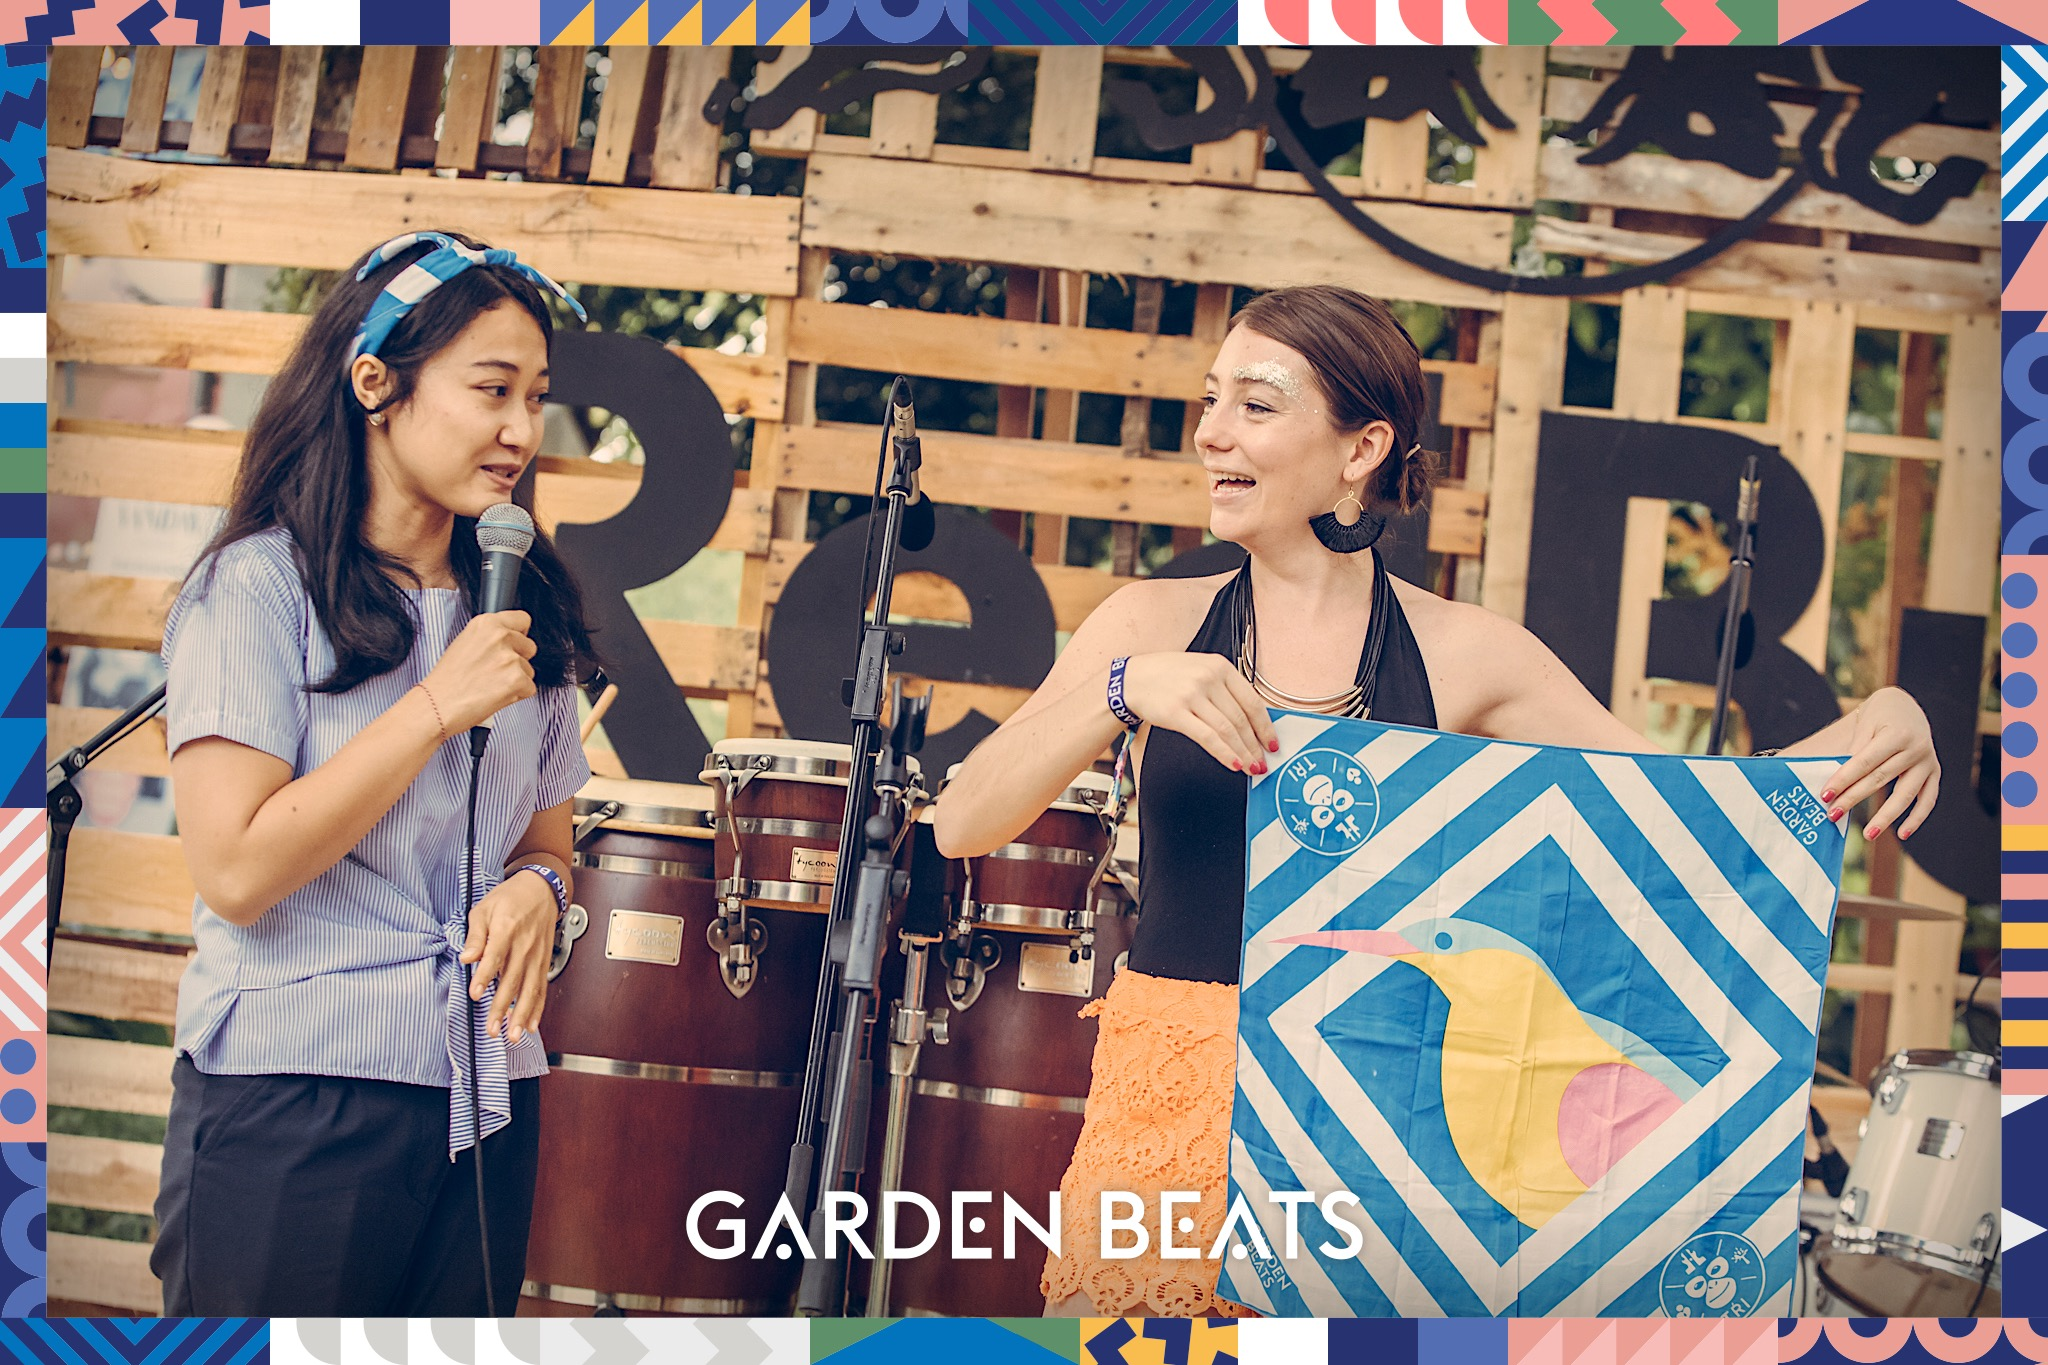 03032018_GardenBeats_Colossal499_Watermarked.jpg